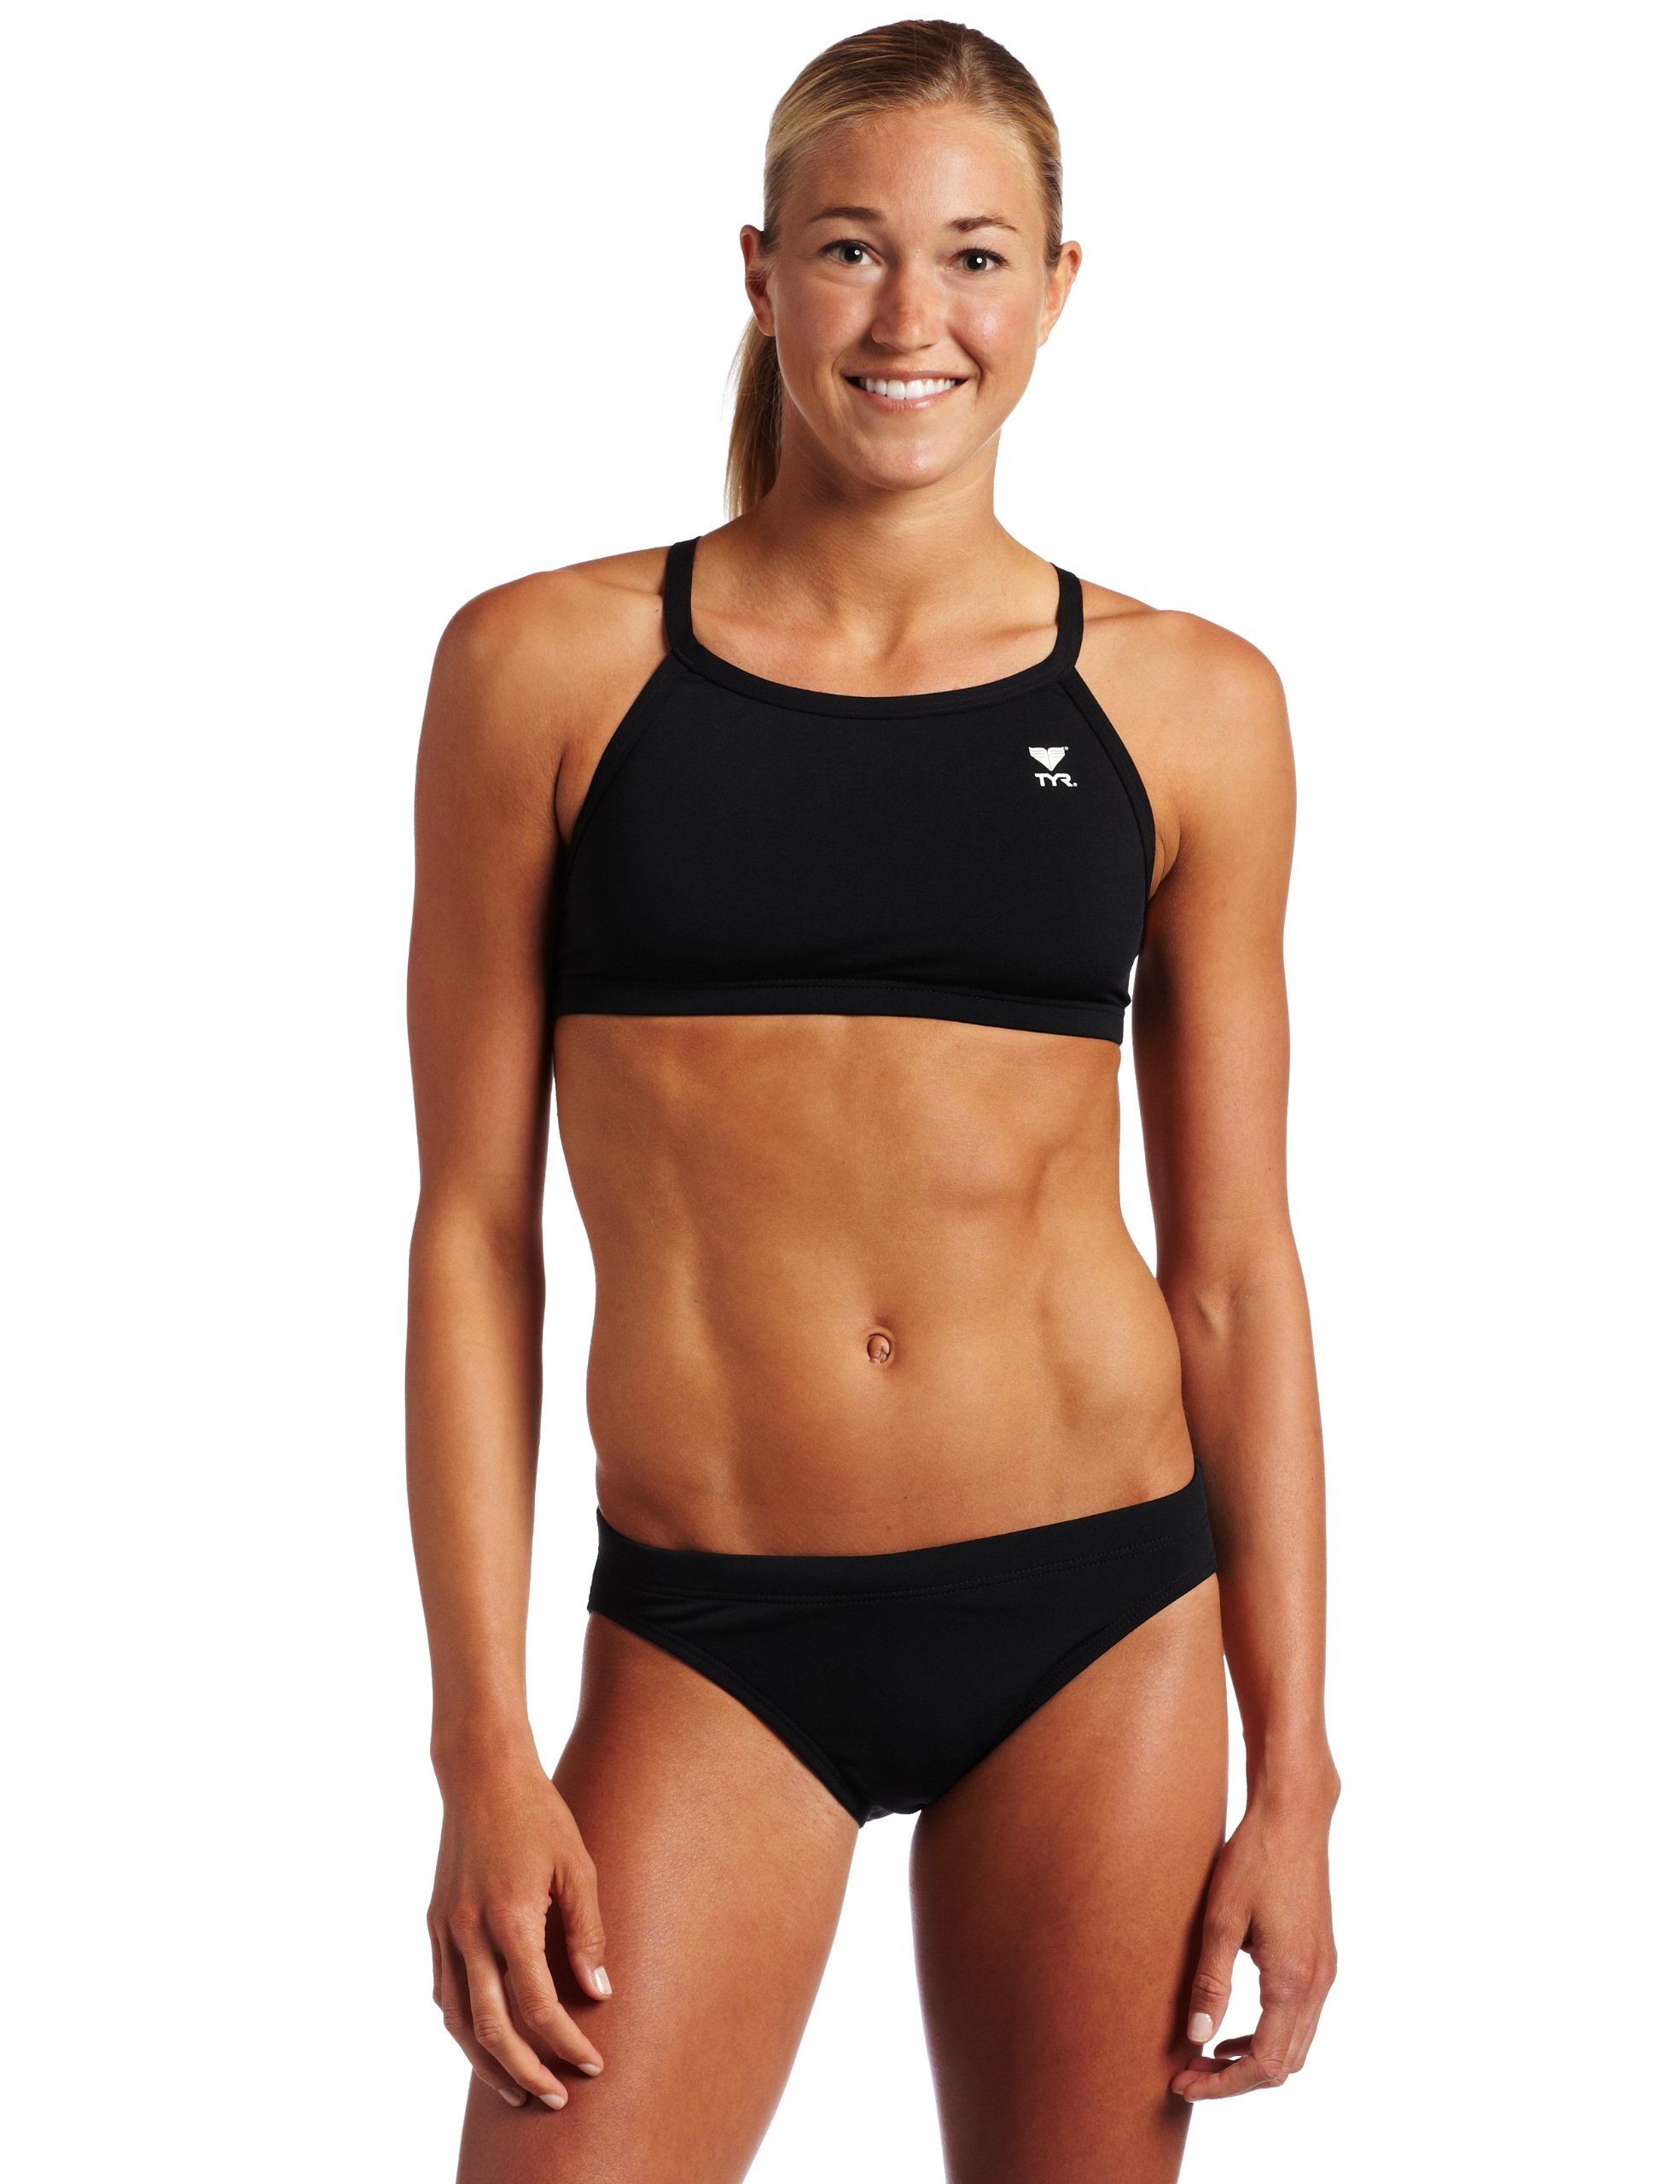 TYR Women's Solid Durafast Diamondback Workout Bikini,Black,Small